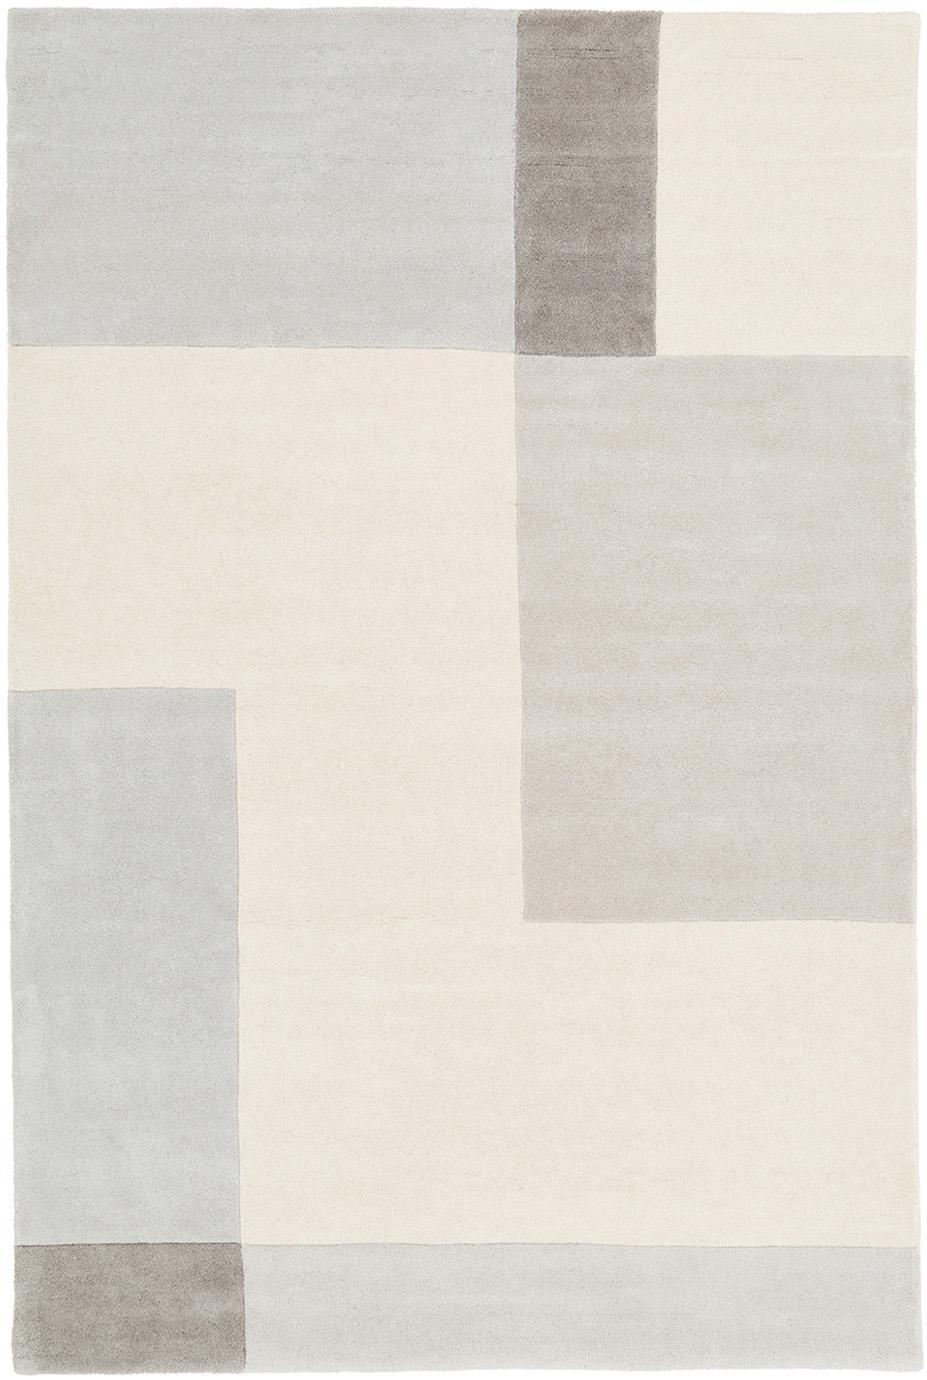 Alfombra artesanal de lana Keith, Parte superior: 100%lana, Reverso: algodón, Beige, gris, An 120 x L 180  cm(Tamaño S)